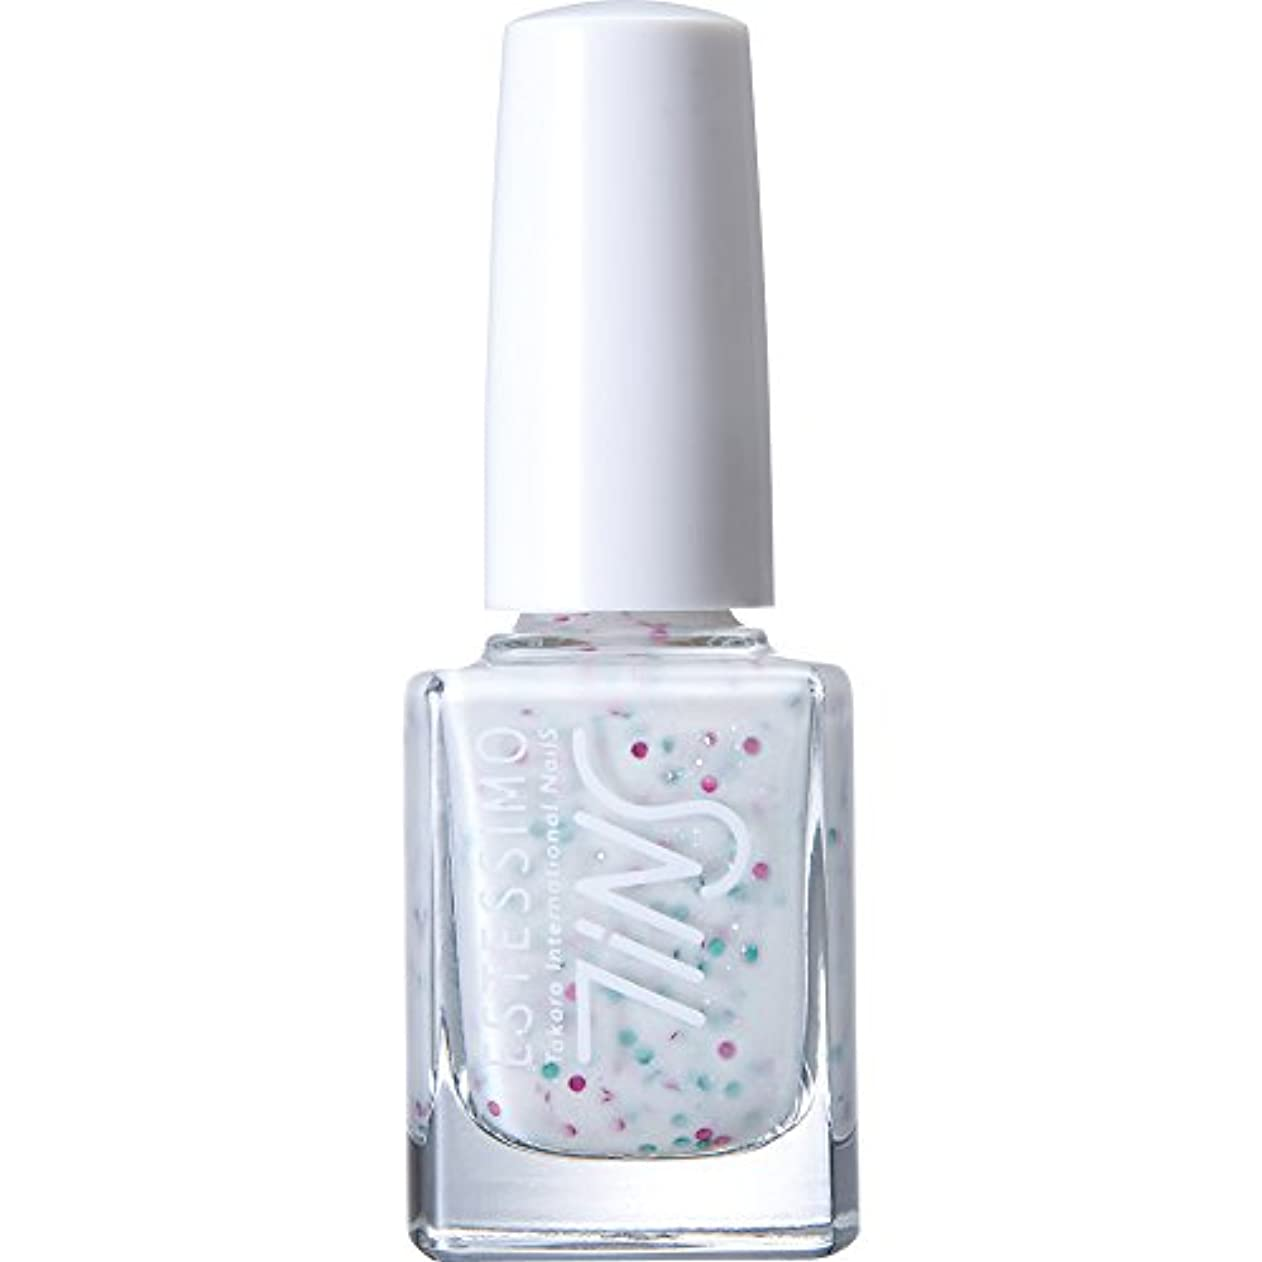 TiNS カラーポリッシュ 801 シュガーミルクシェイク 11ml 2015年春の限定色「Sugarsprinkles! 」シリーズ